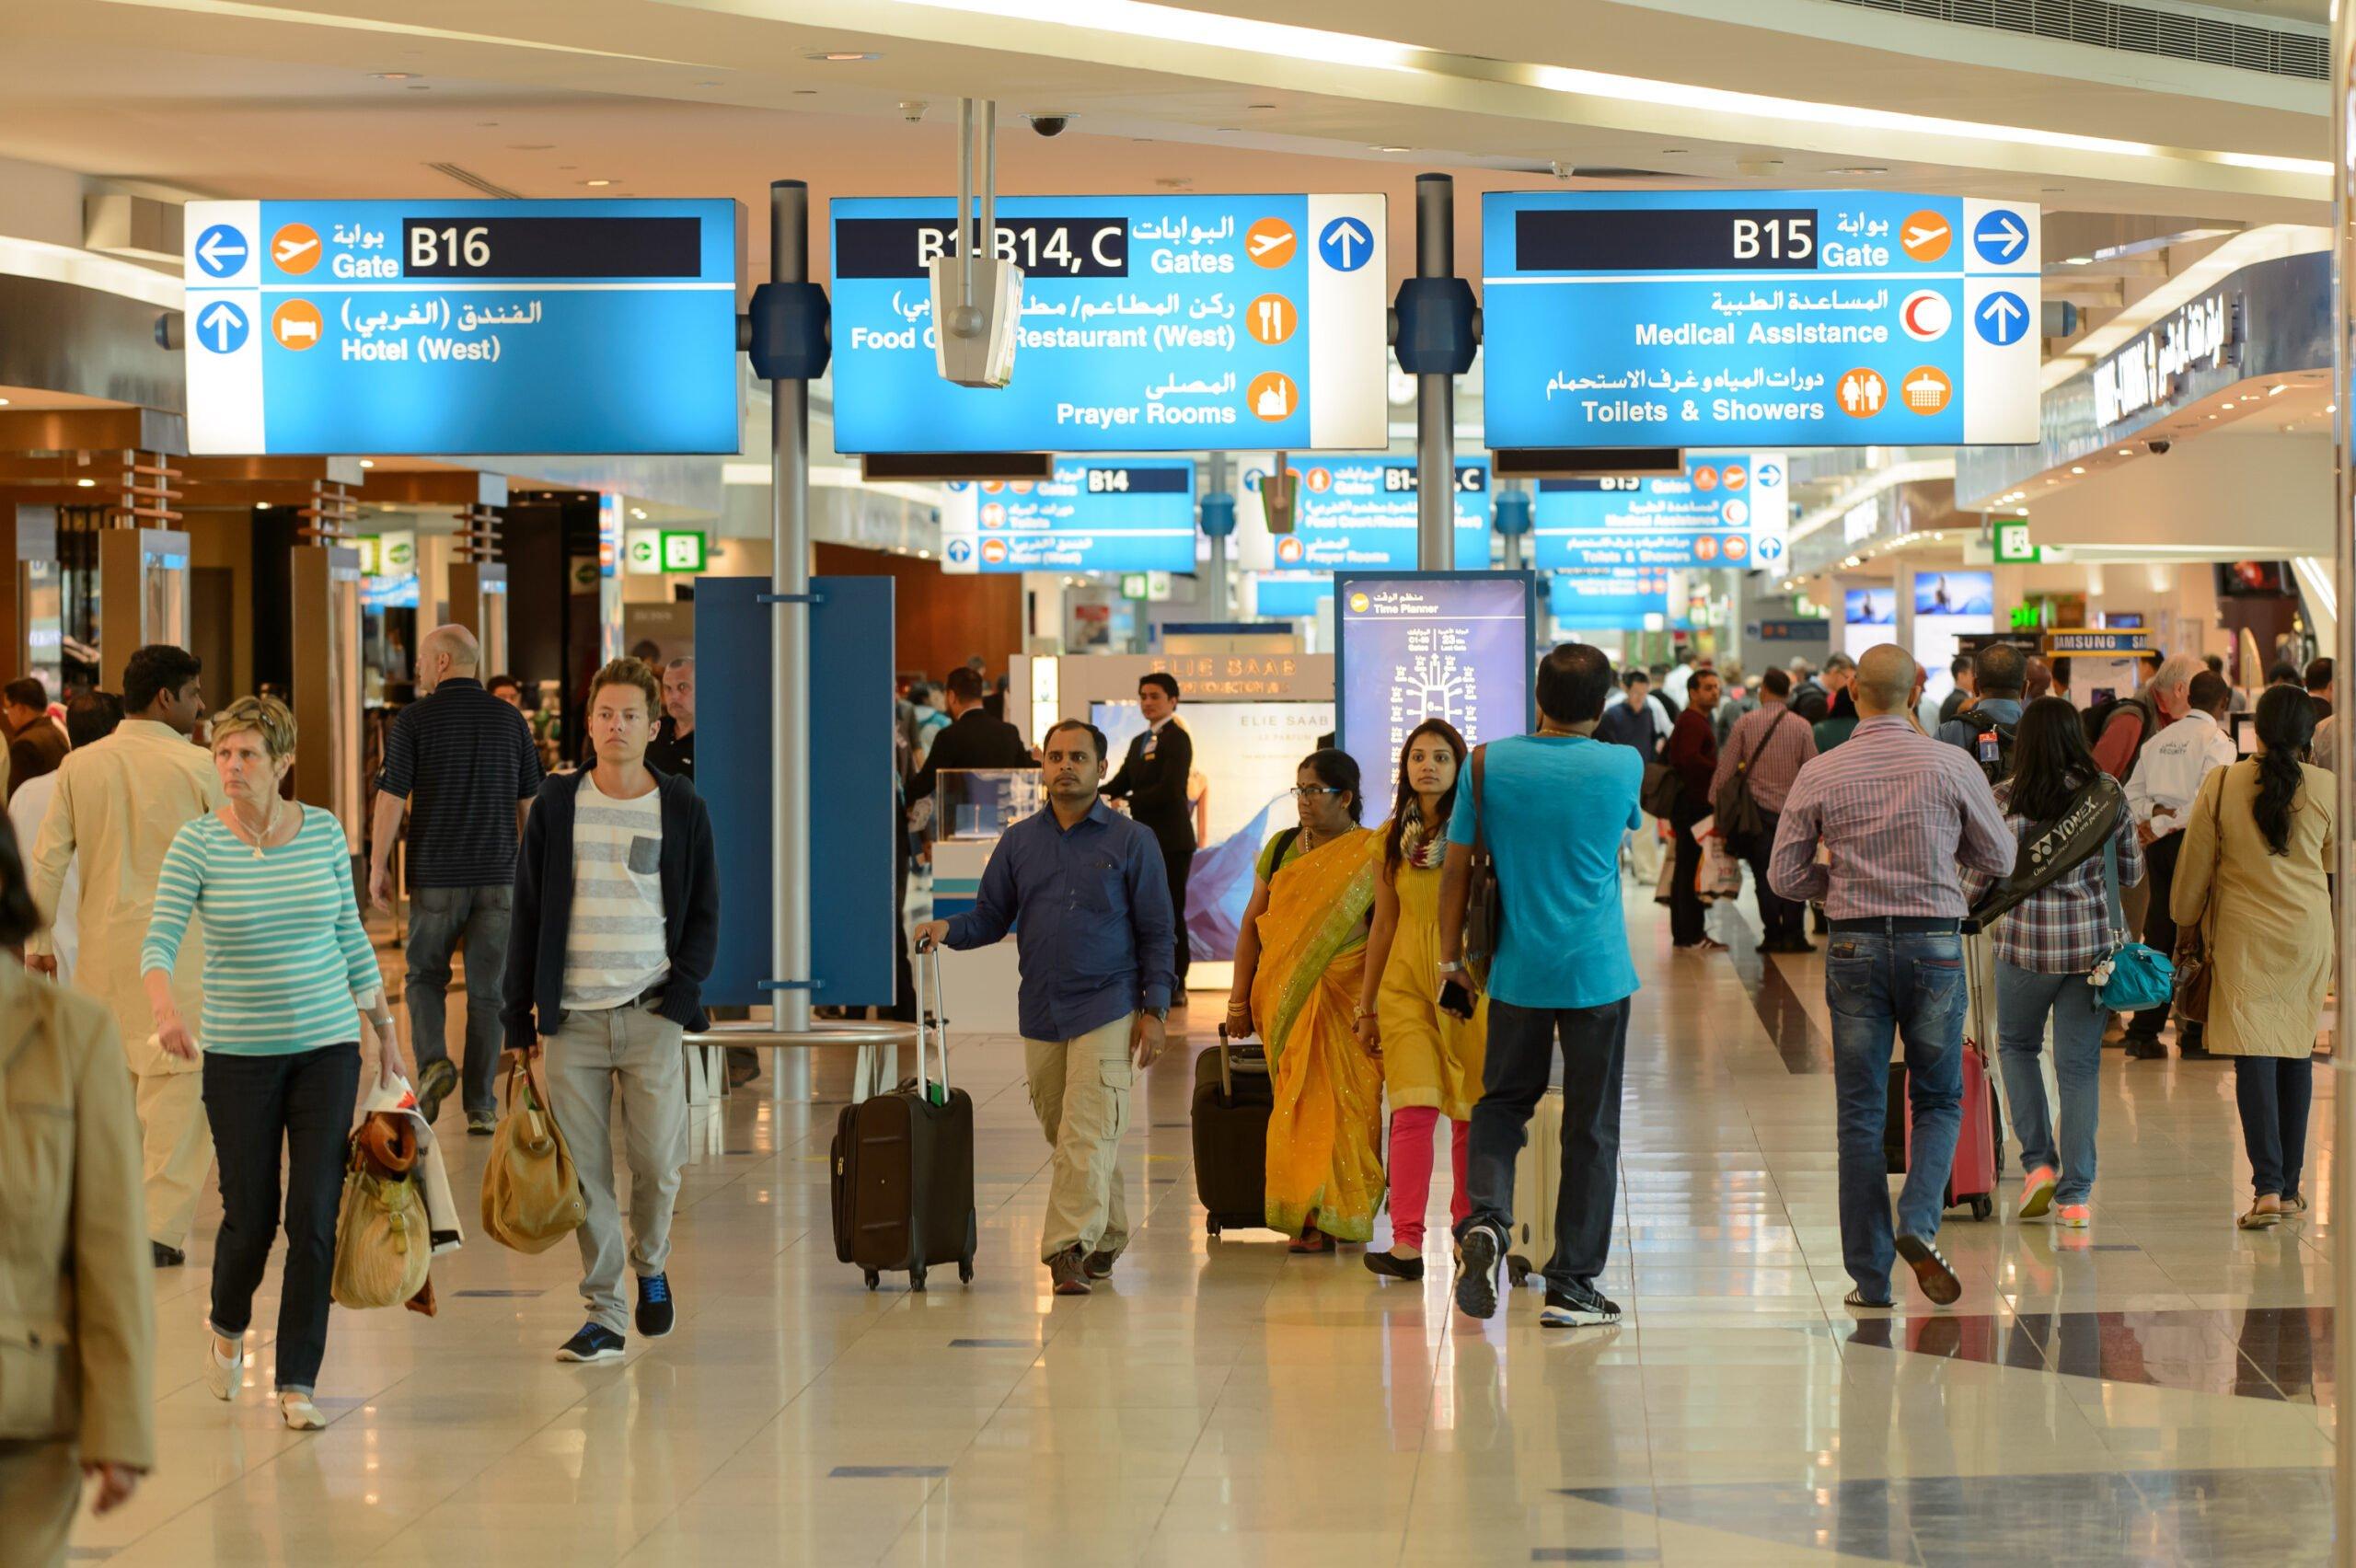 Do I need a visa for connecting flights Dubai